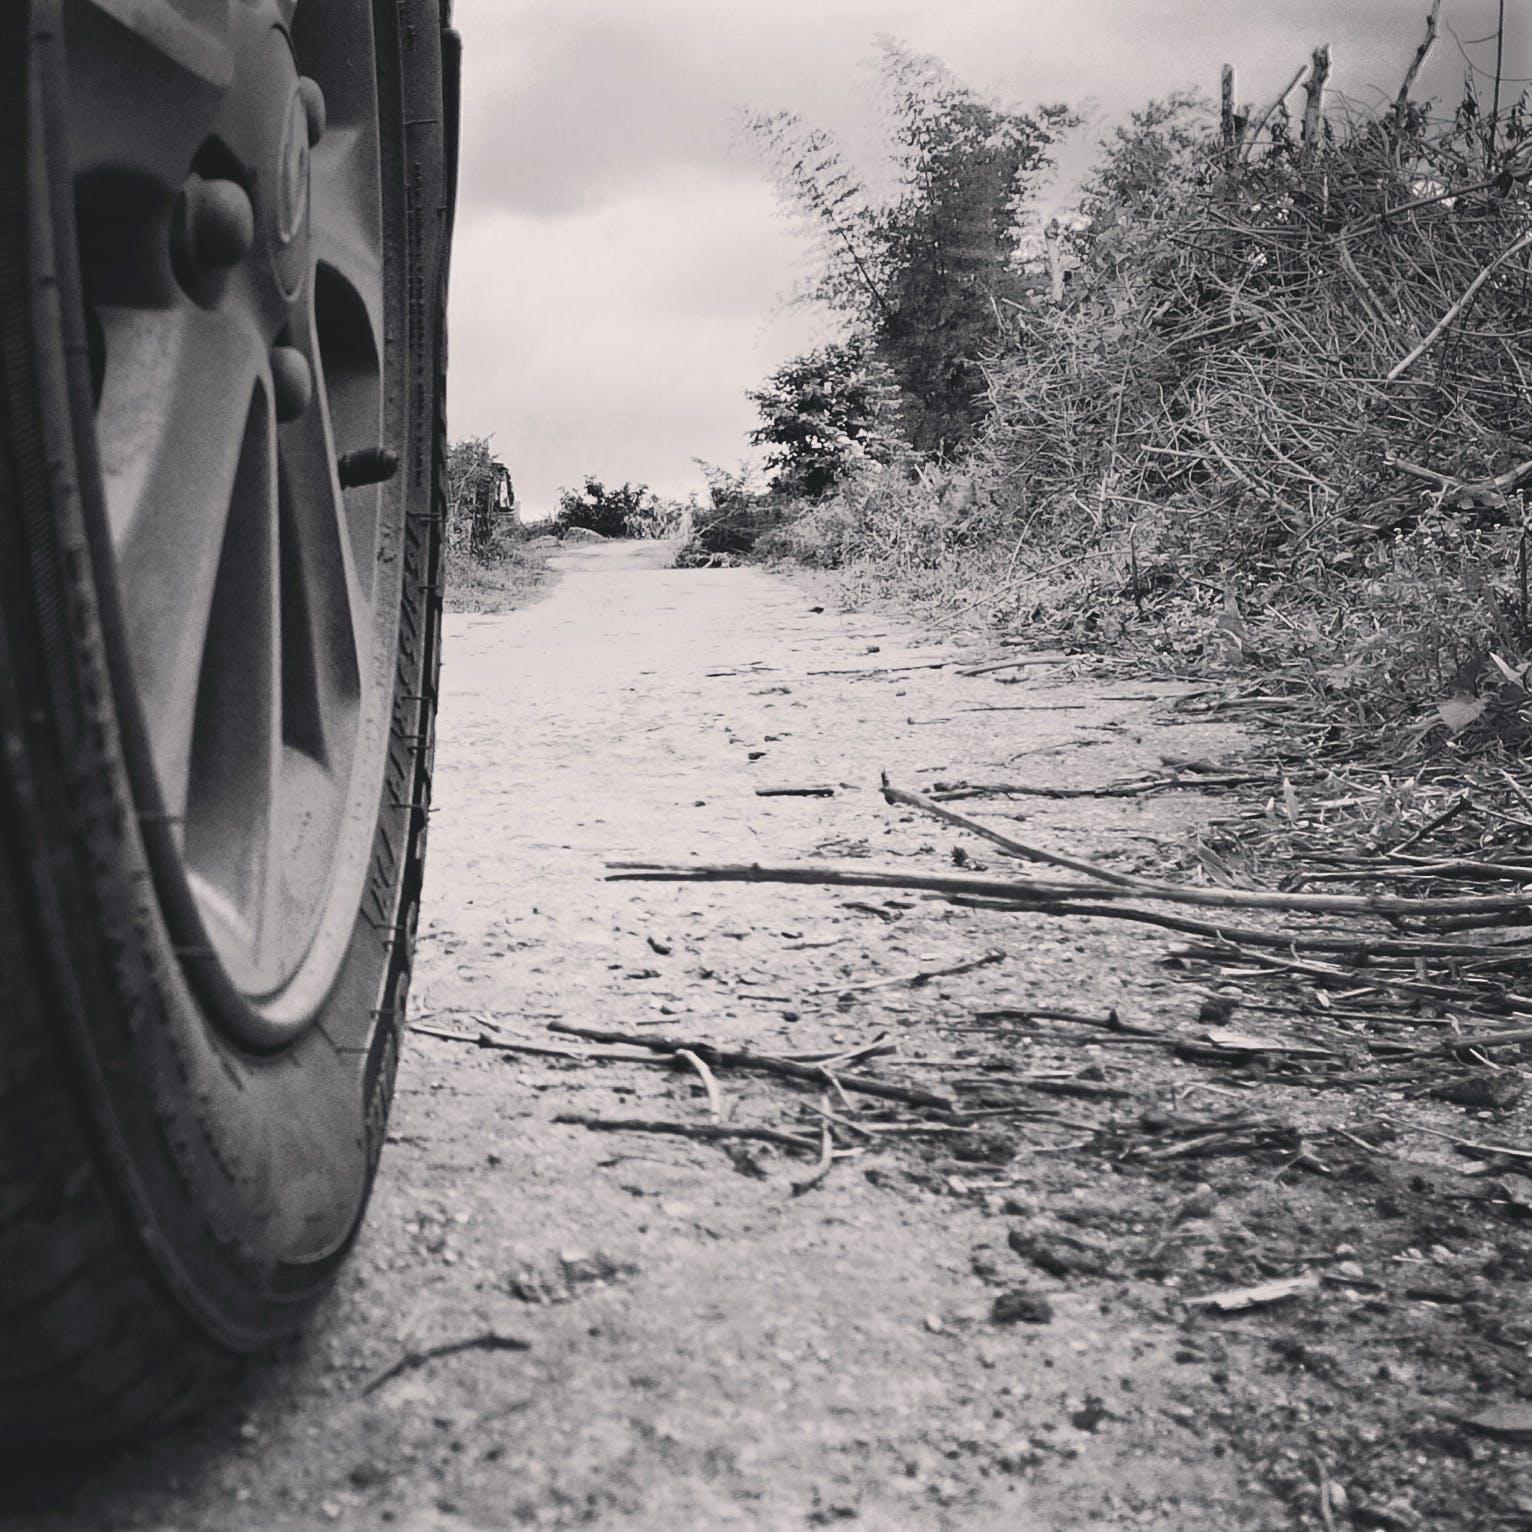 Free stock photo of dusty road